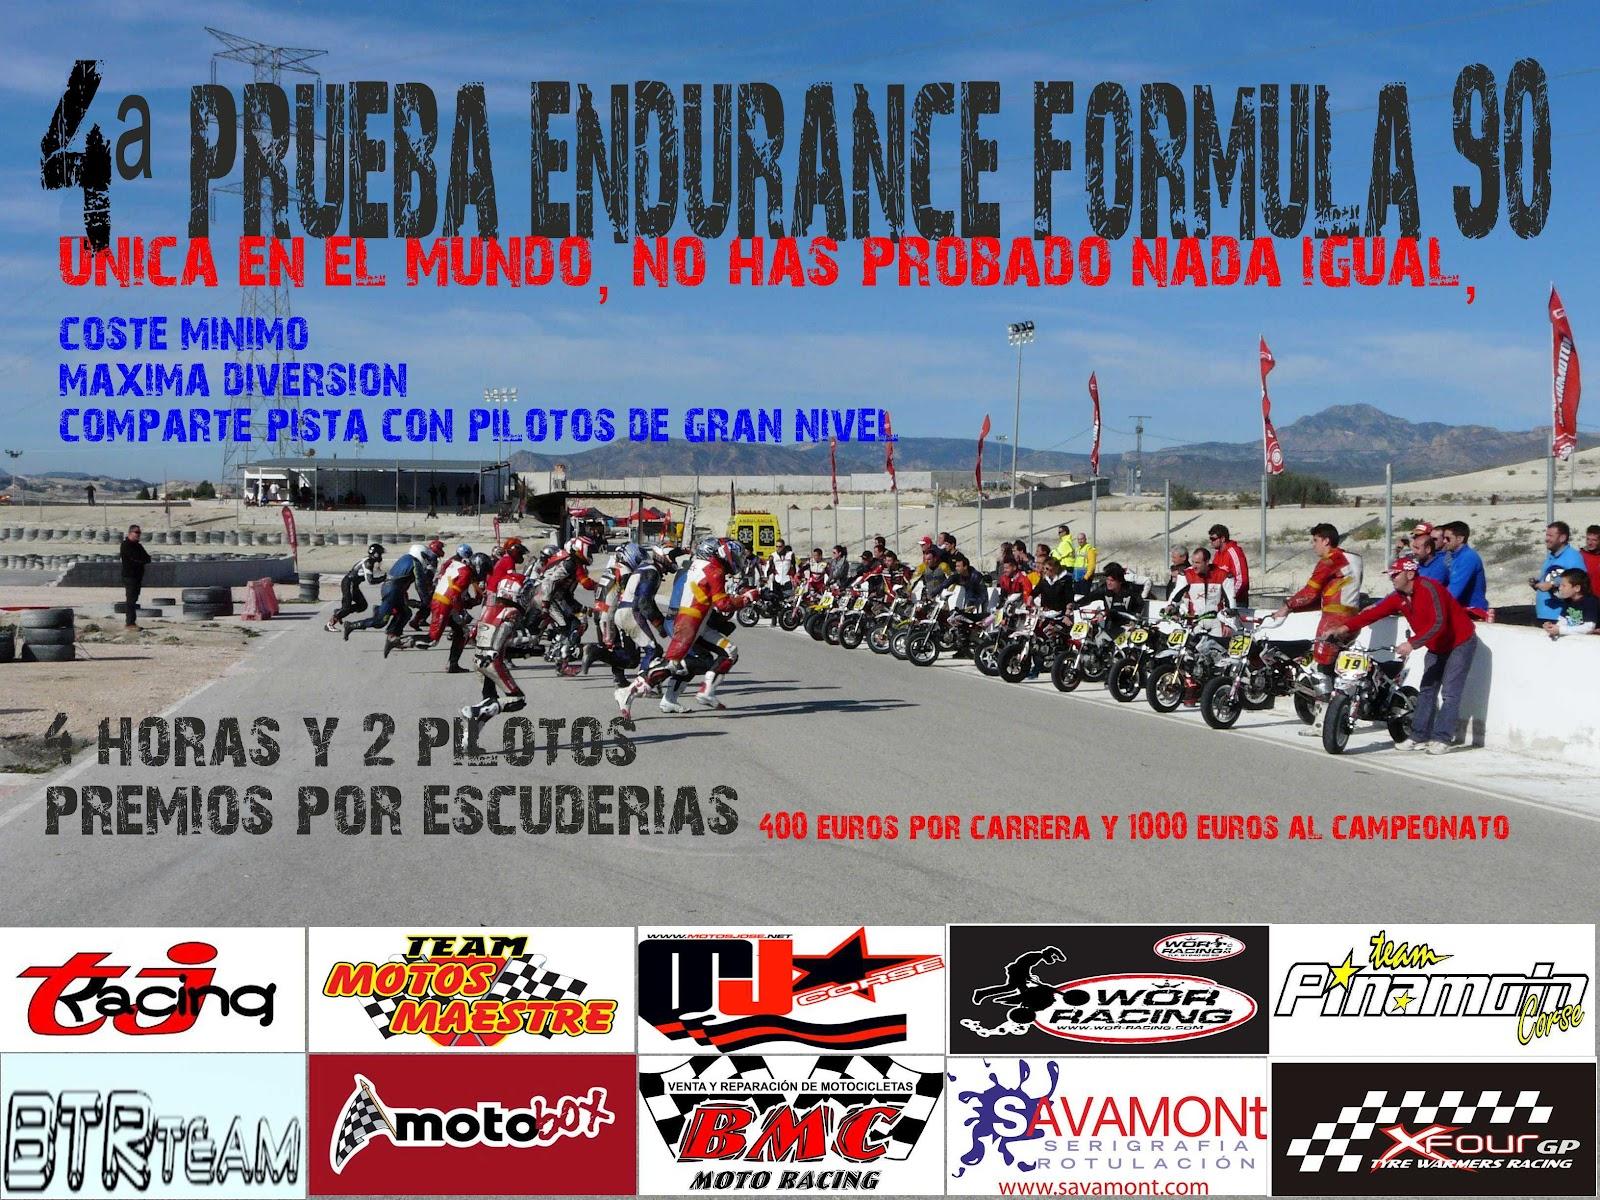 Circuito Jumilla : 4ª prueba endurance formula 90